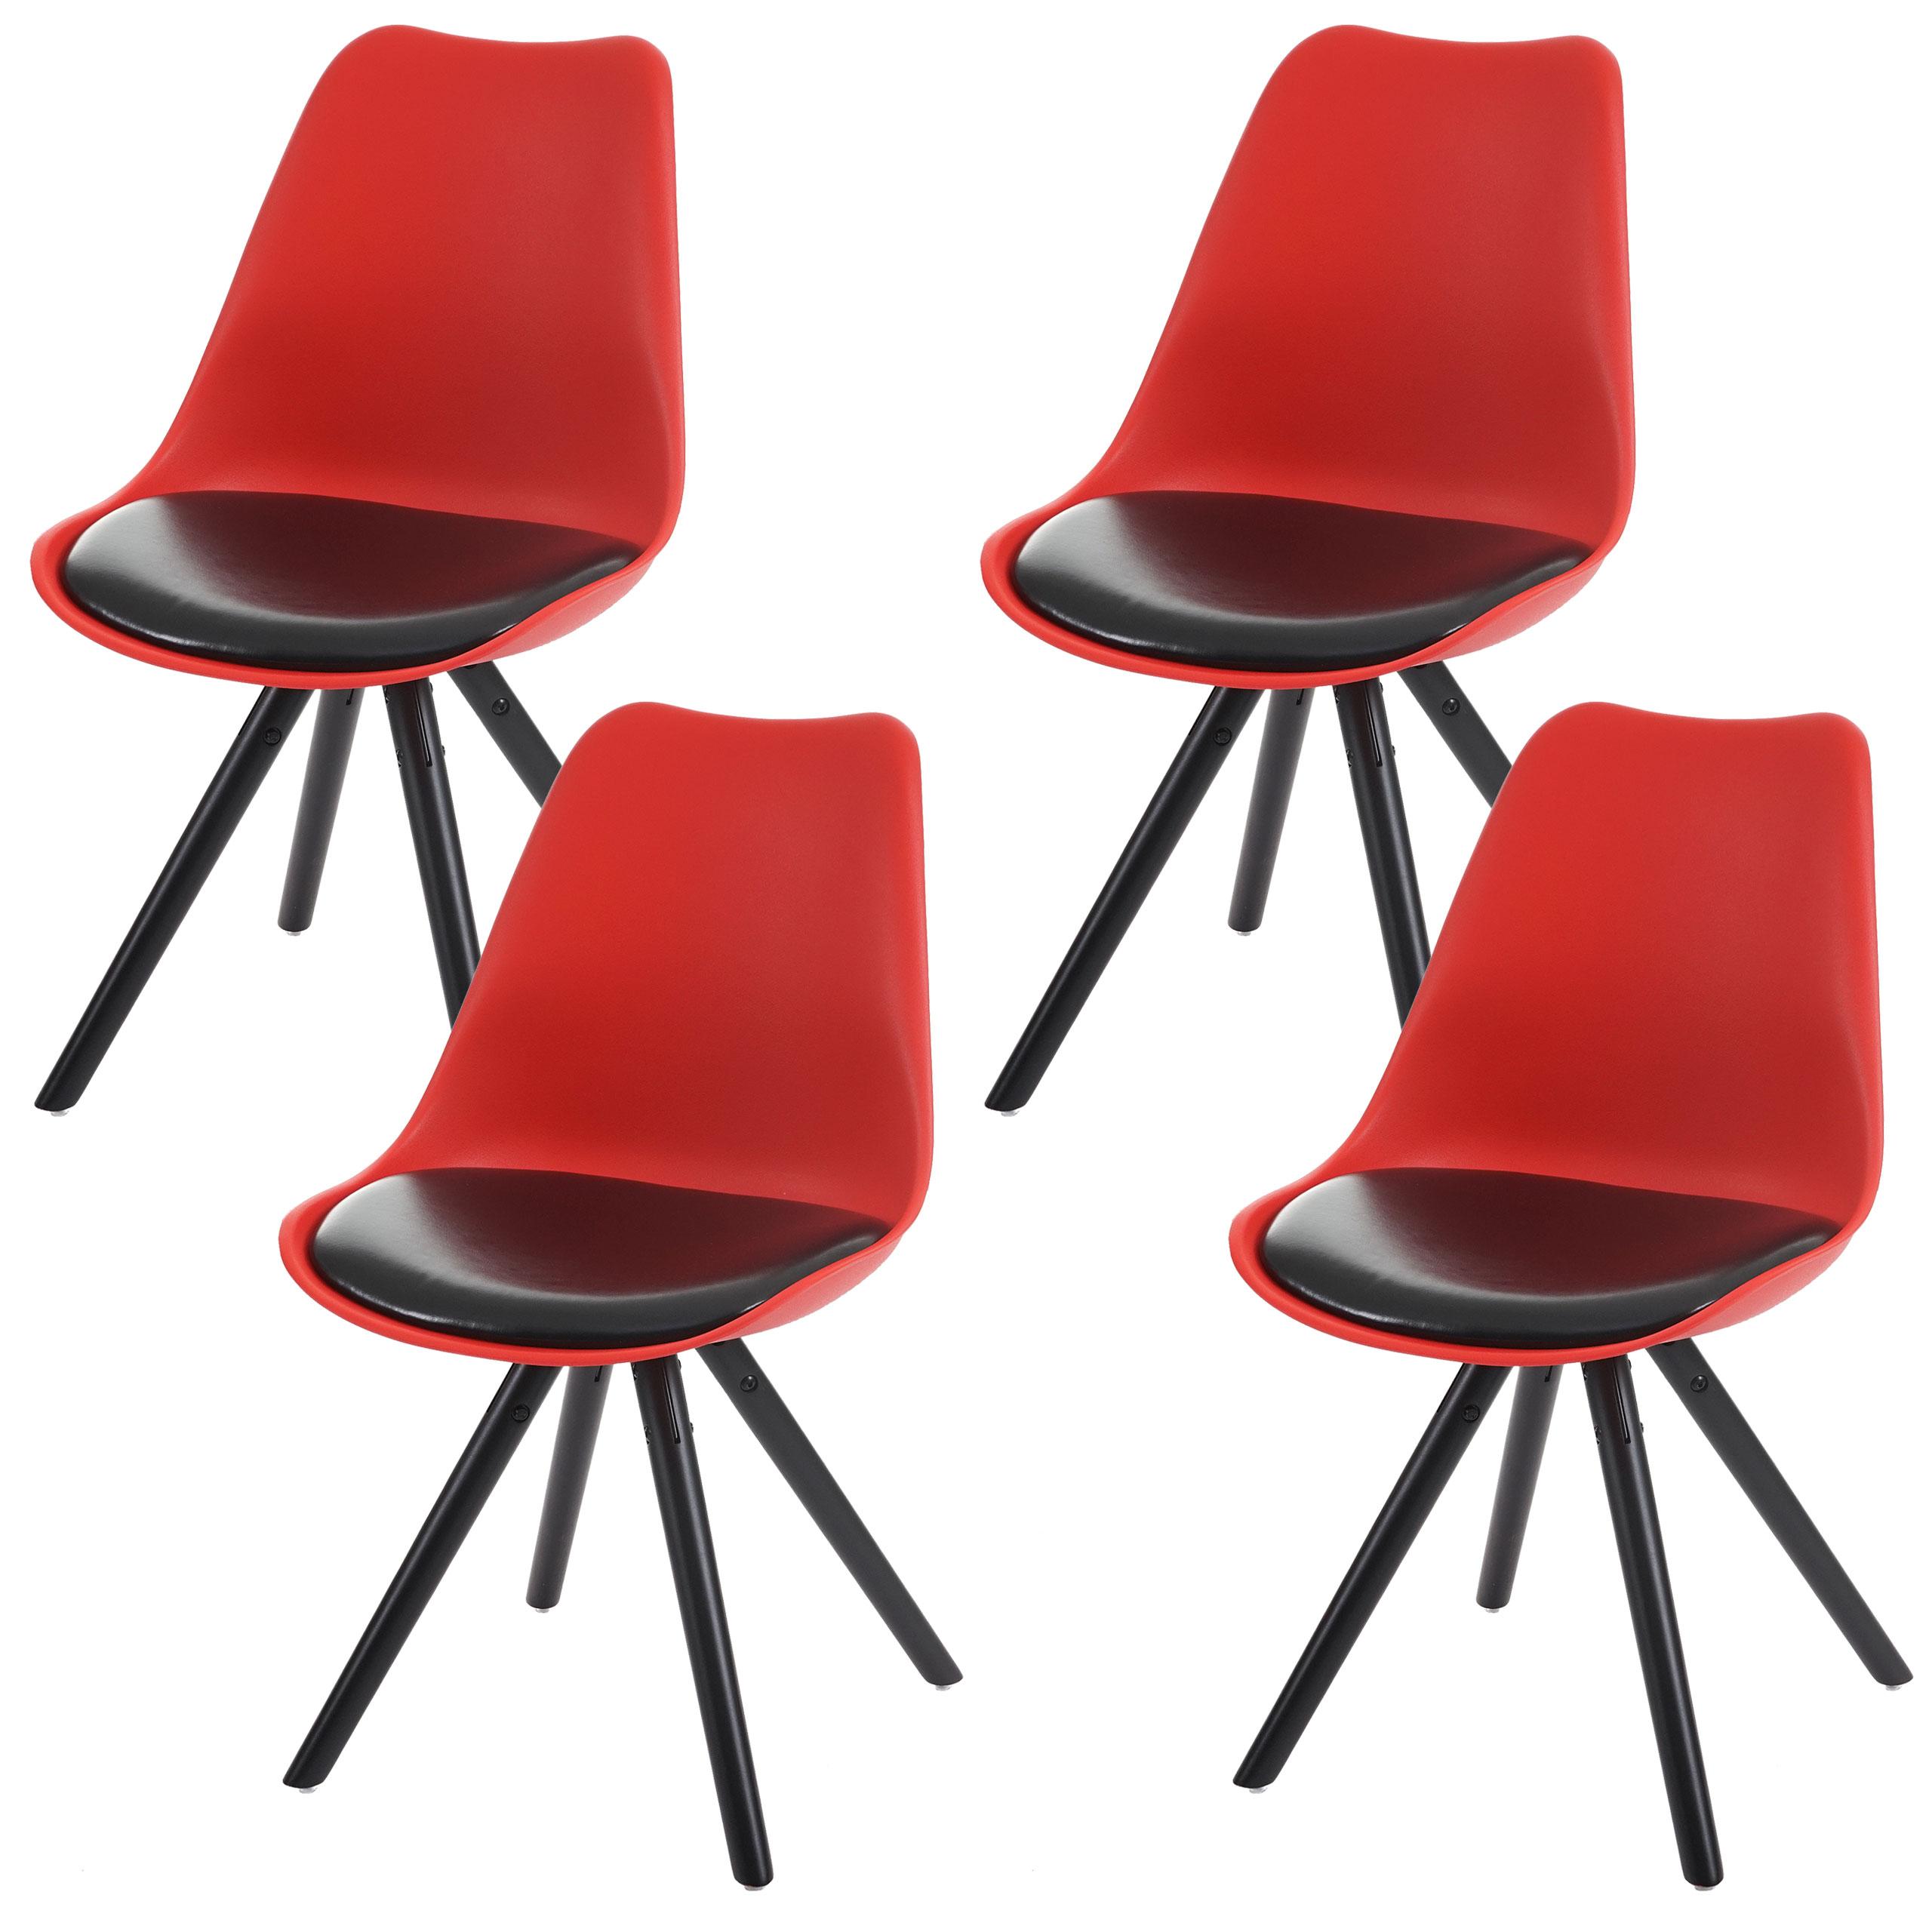 4x esszimmerstuhl vaasa t501 sitzfl che kunstleder schwarz dunkle beine rot. Black Bedroom Furniture Sets. Home Design Ideas